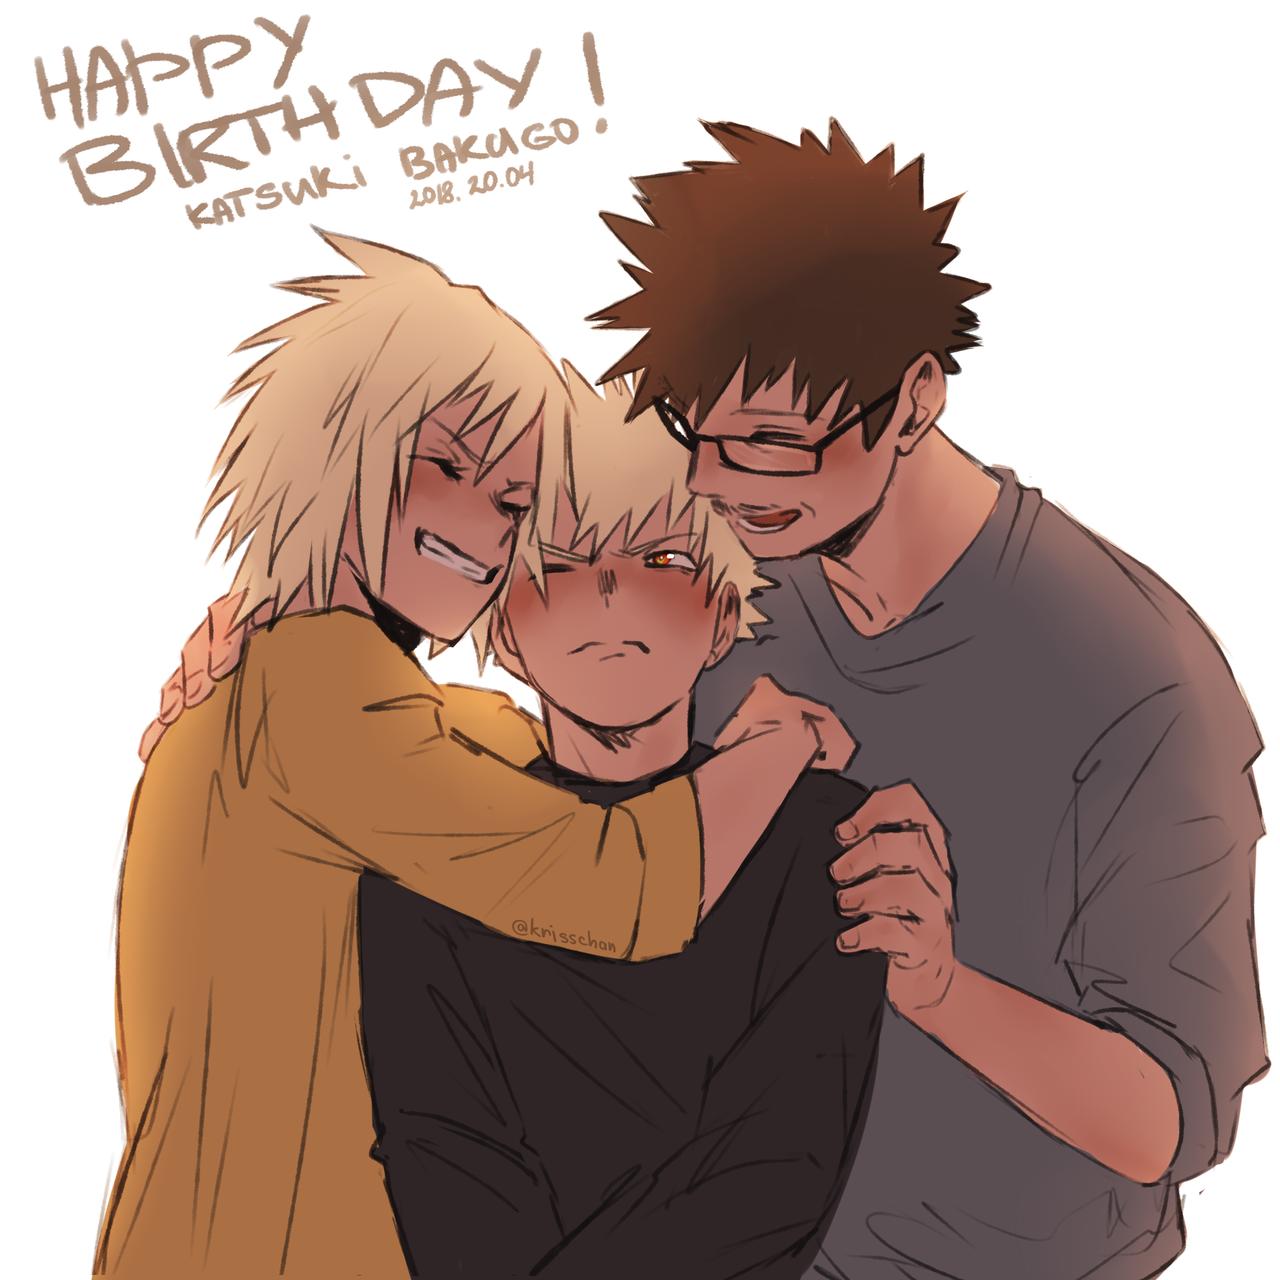 Bakusquad Everyday Today Is My Bakugou S Birthday I M Very Very Happy Happy New Year My Baby Today Is V Anime Cute Anime Guys Anime Sketch